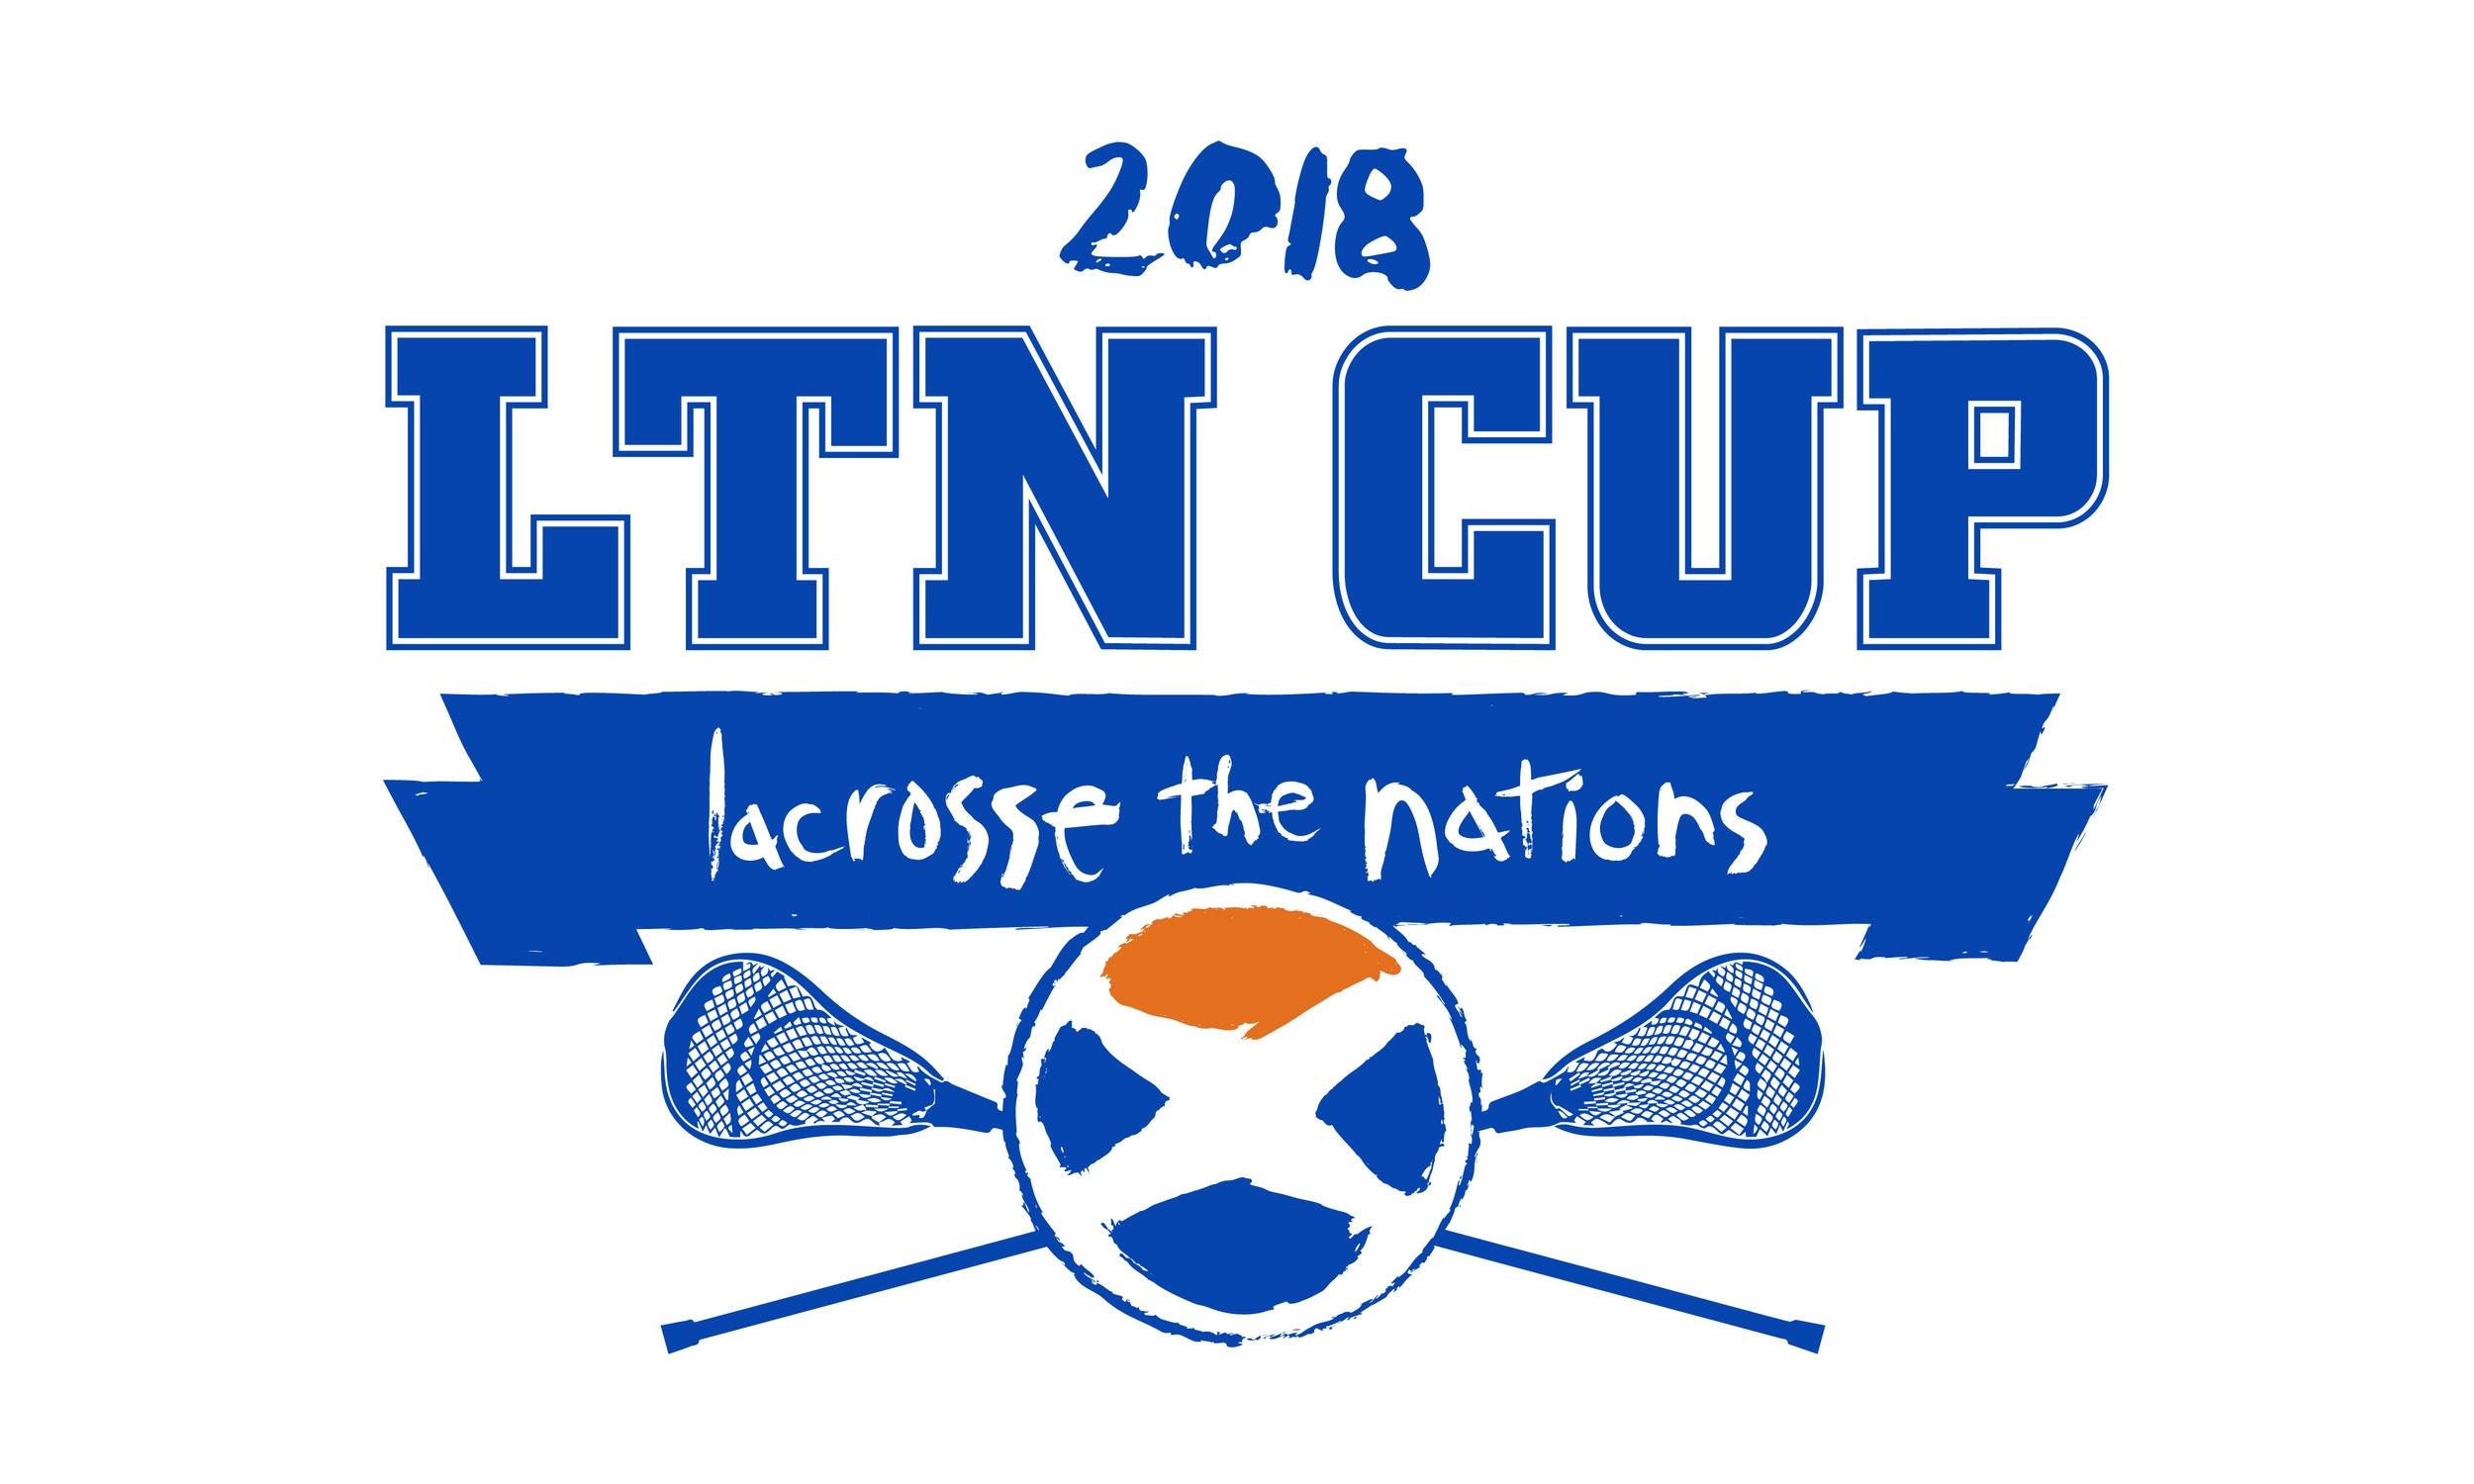 2018 LtN Cup Logo_Blue and Orange FOR WEB.jpg